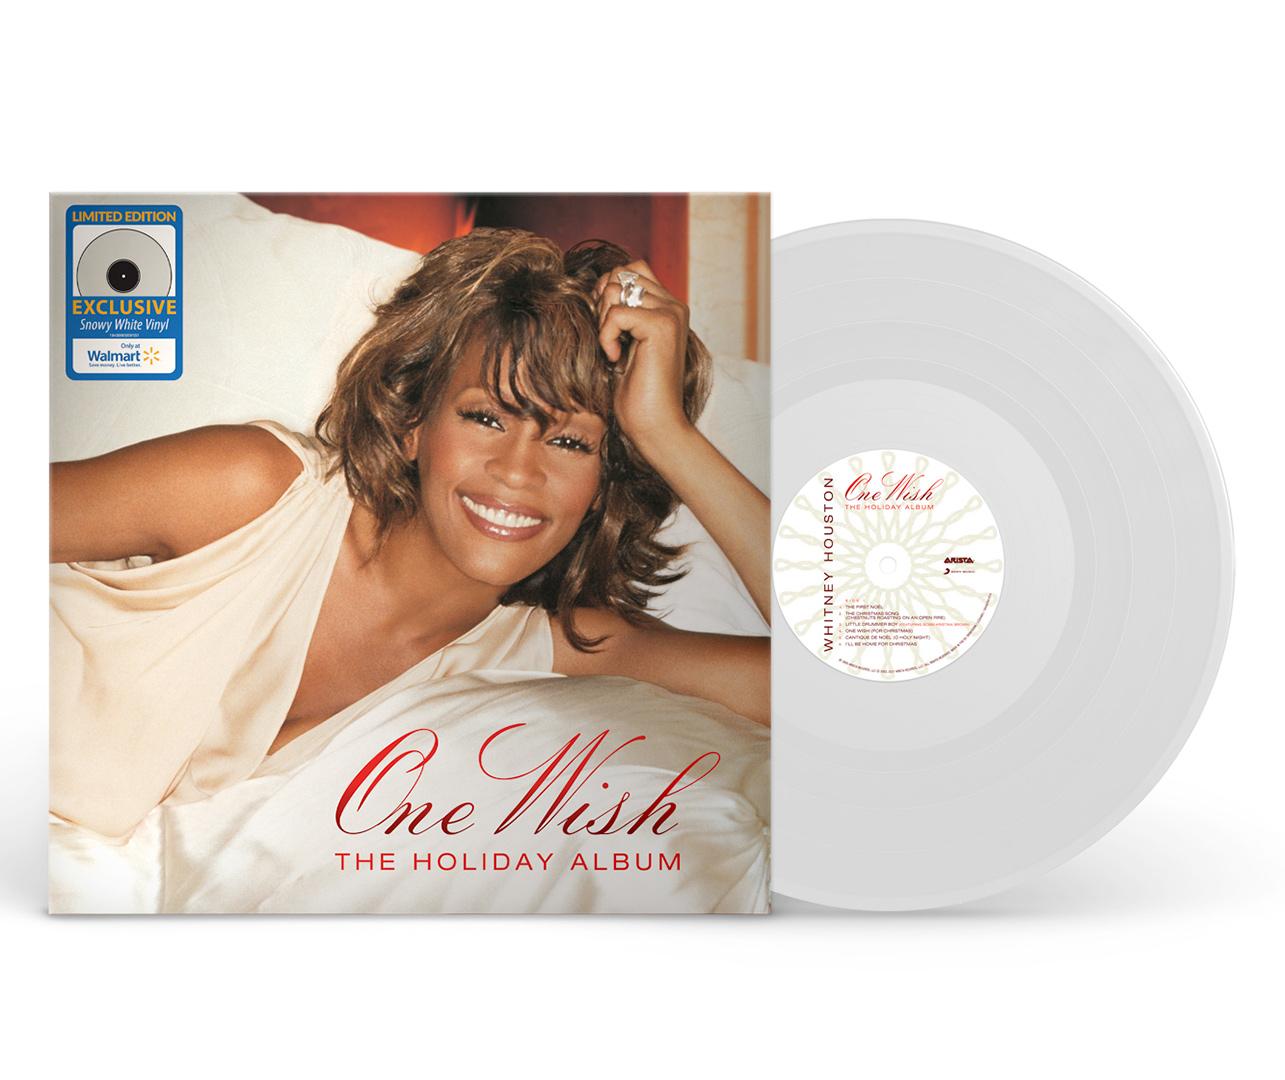 Whitney Houston - One Wish: The Holiday Album white vinyl